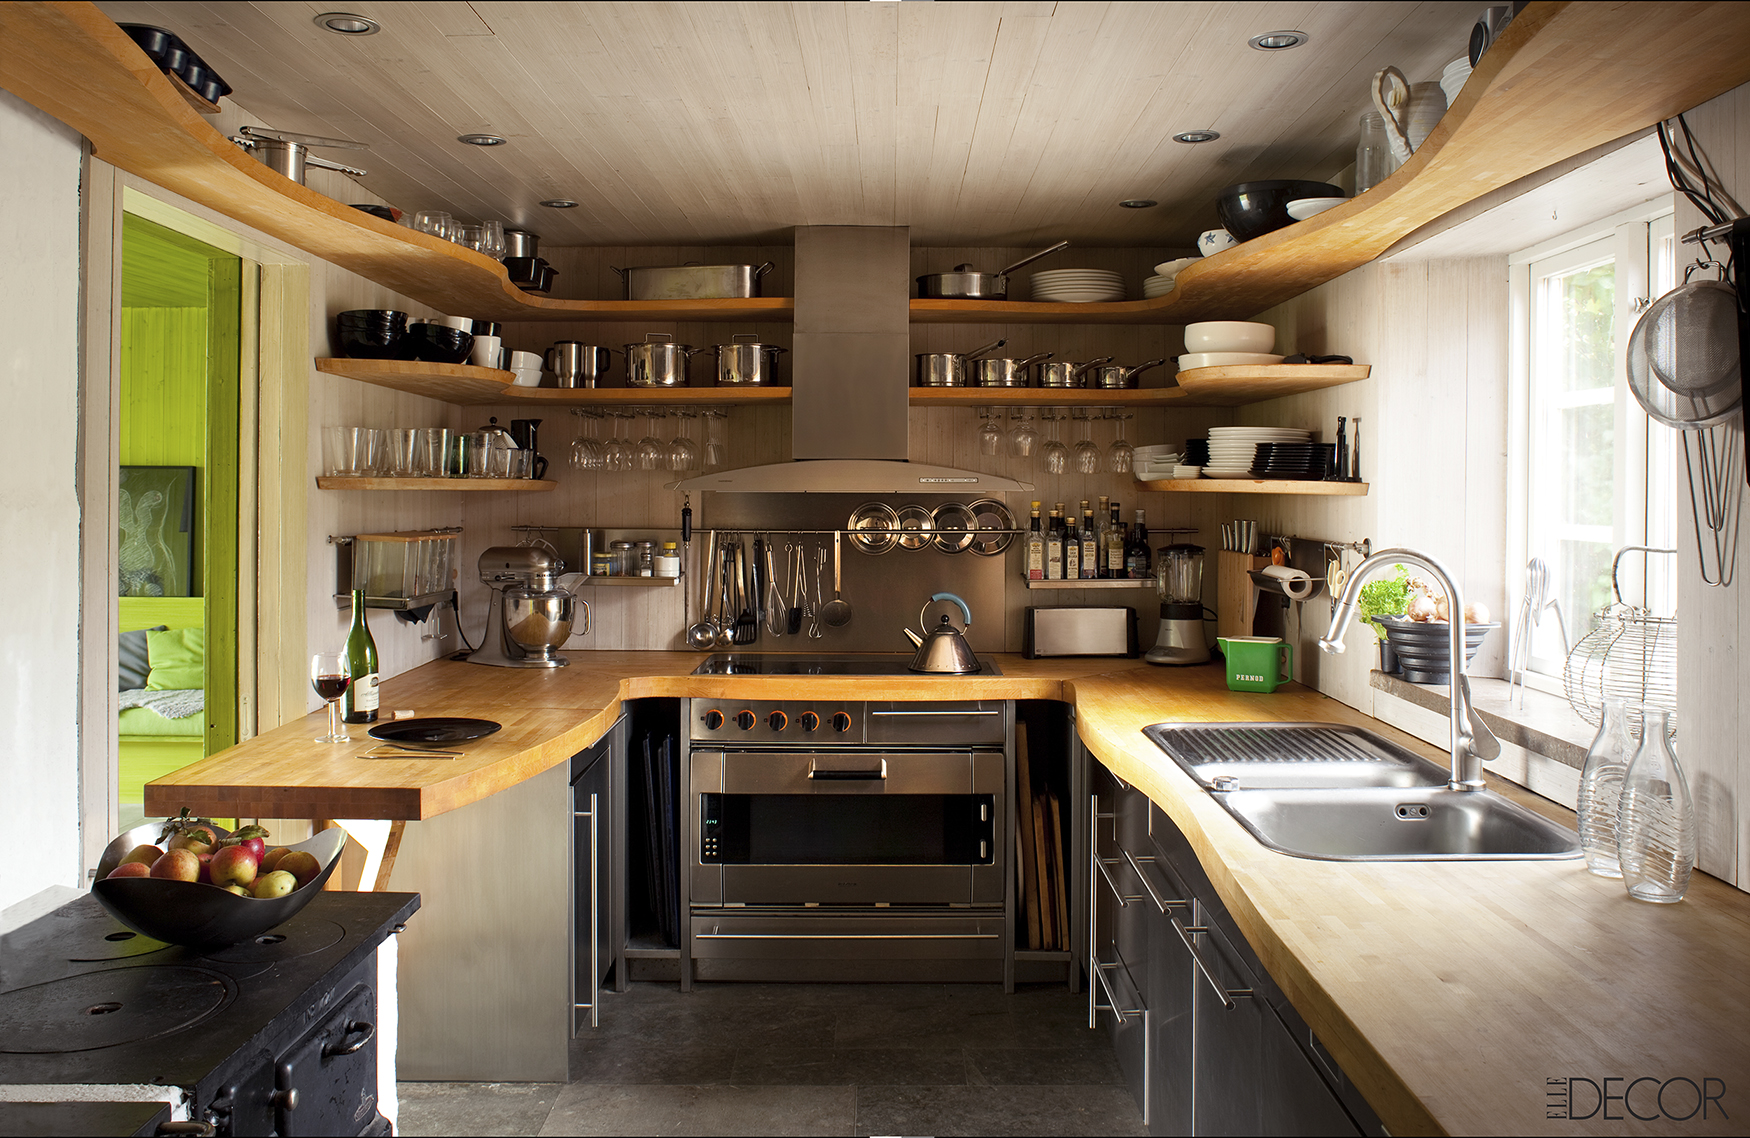 30 small kitchen design ideas decorating tiny kitchens for Kitchen setup designs